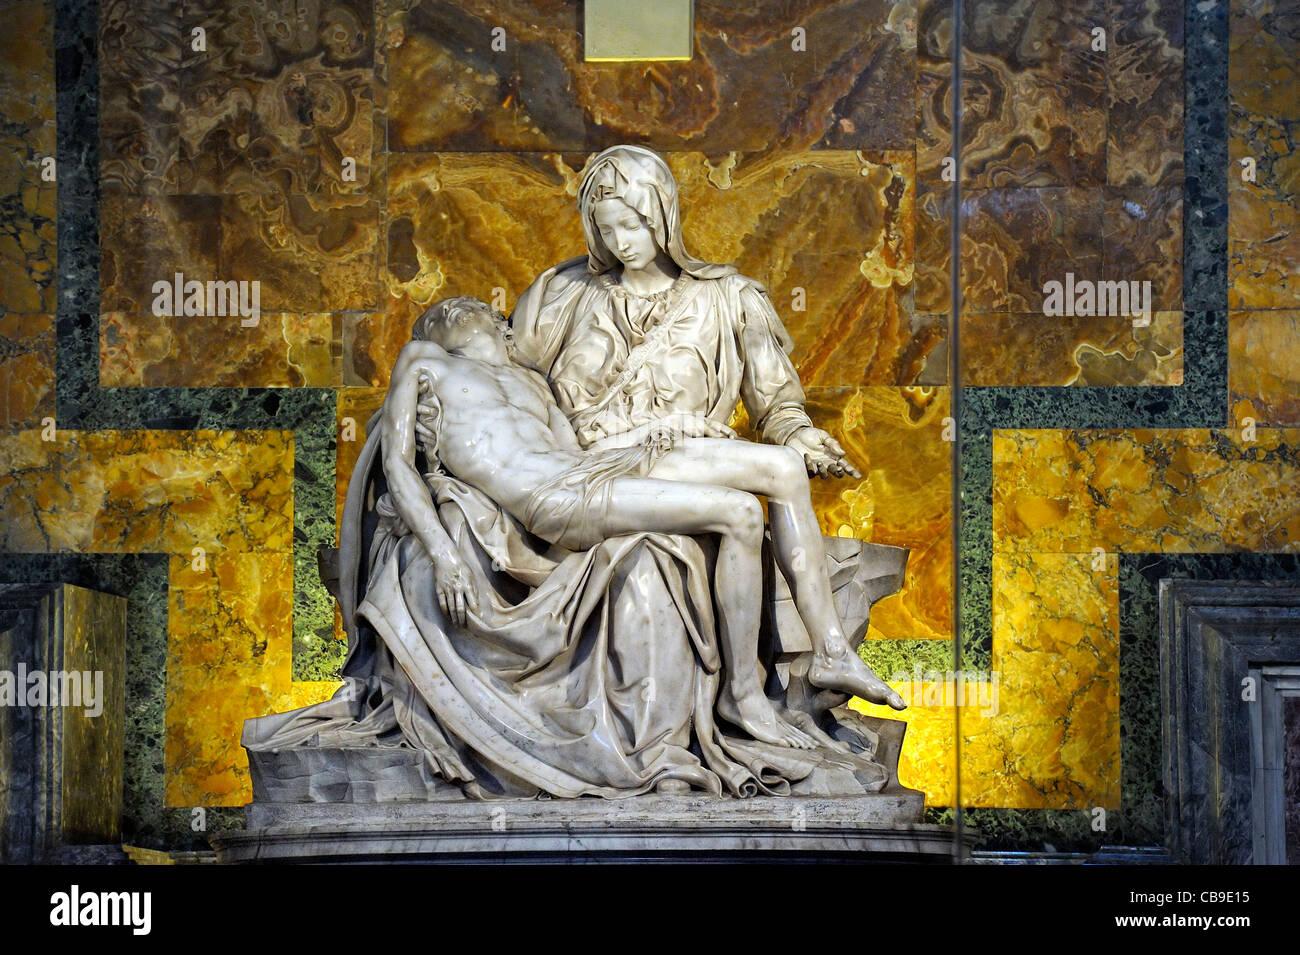 La Pieta by Michelangelo at St Peter Basilica, Rome, Italy. - Stock Image